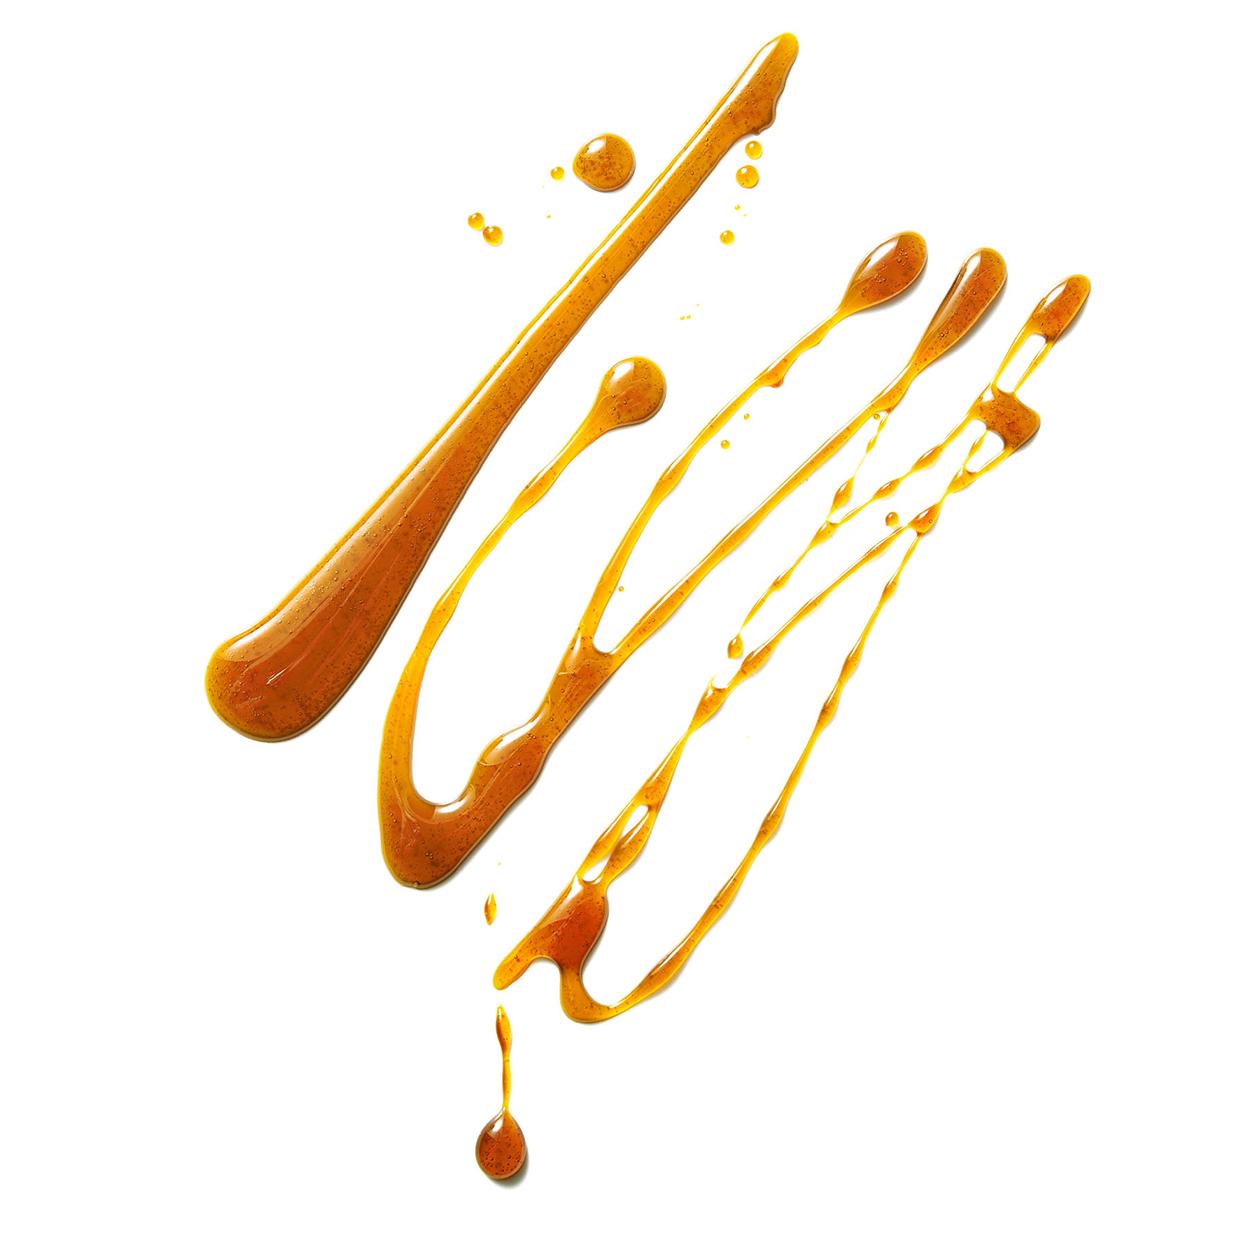 Caramel sauce swirl